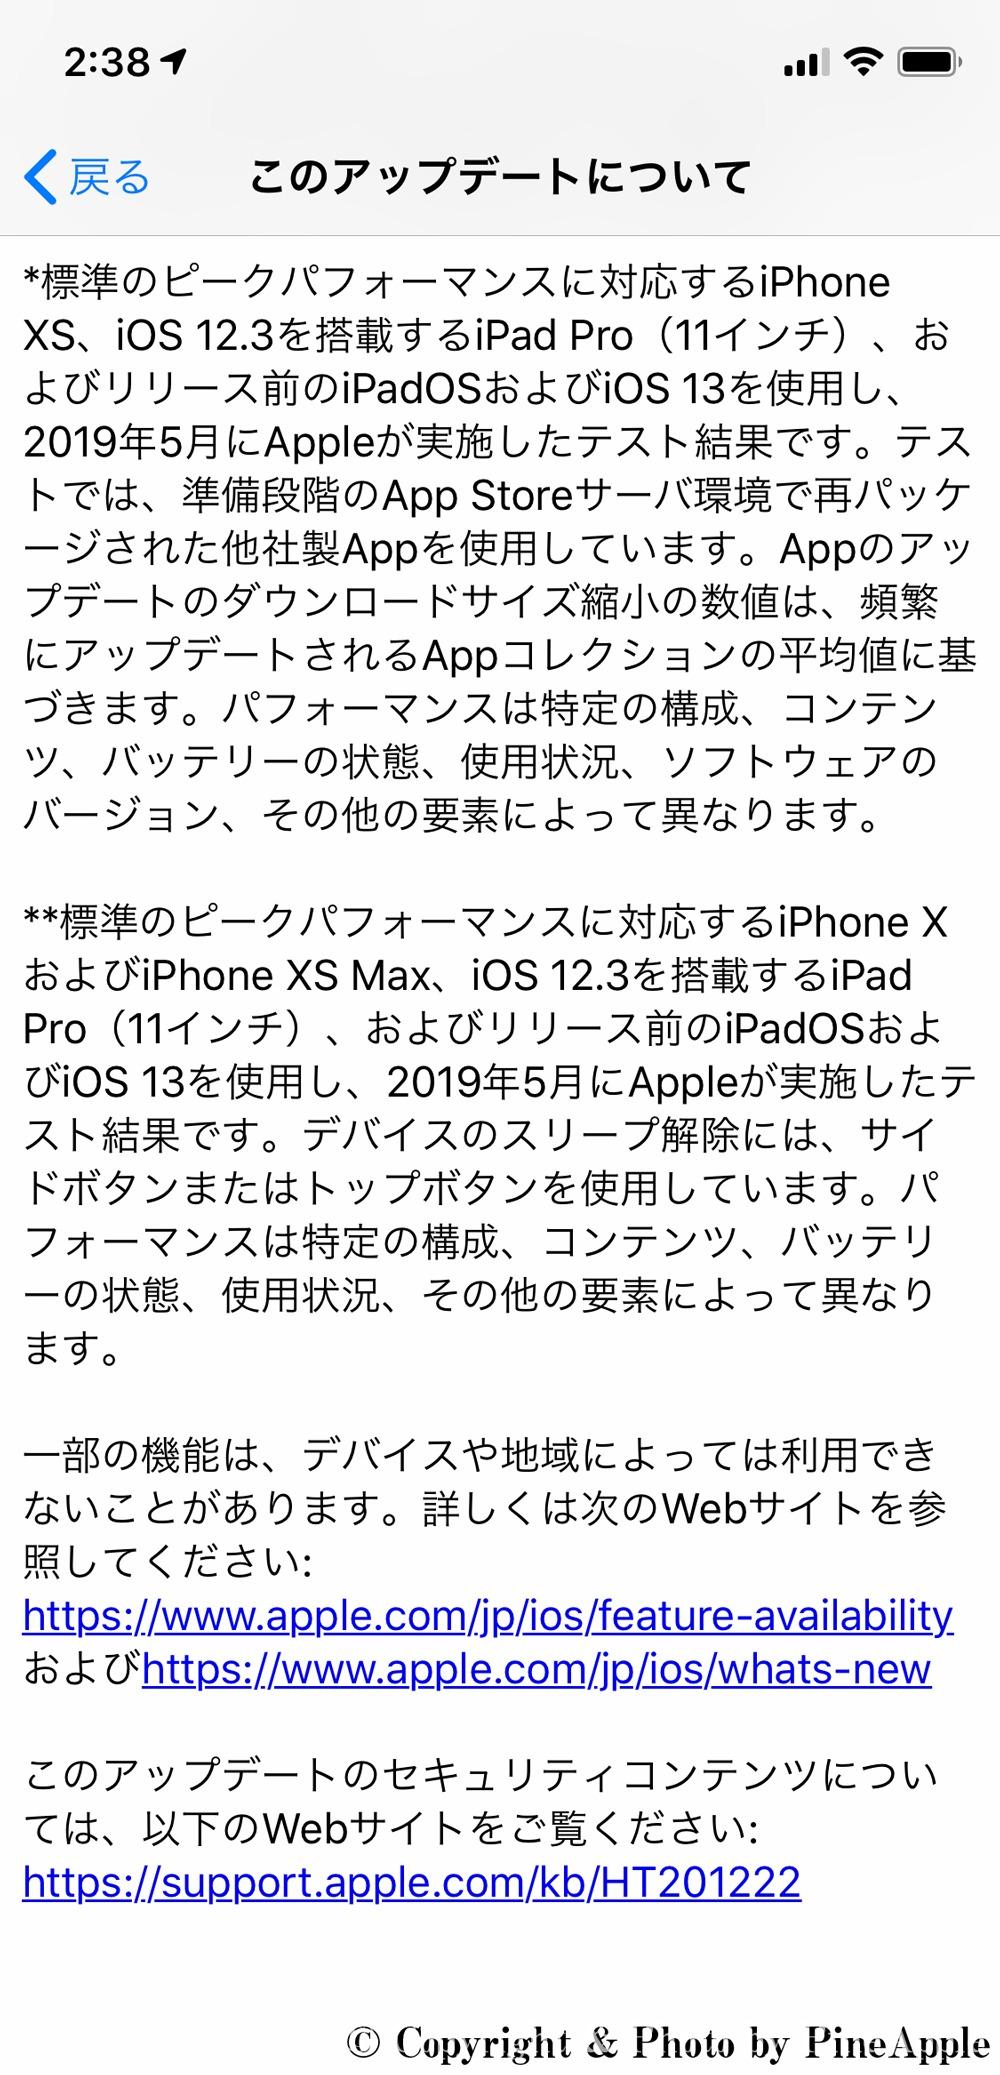 iOS 13:その他の機能および改善